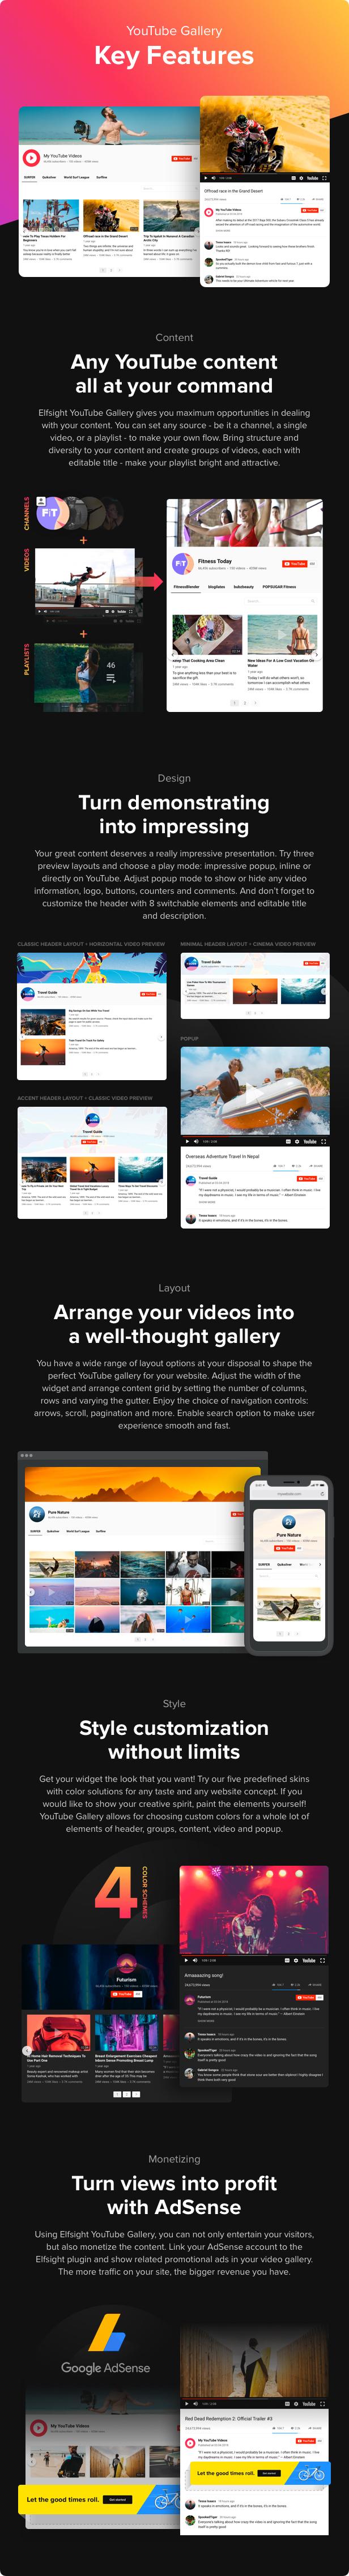 elfsight-youtube-gallery-description-features.jpg